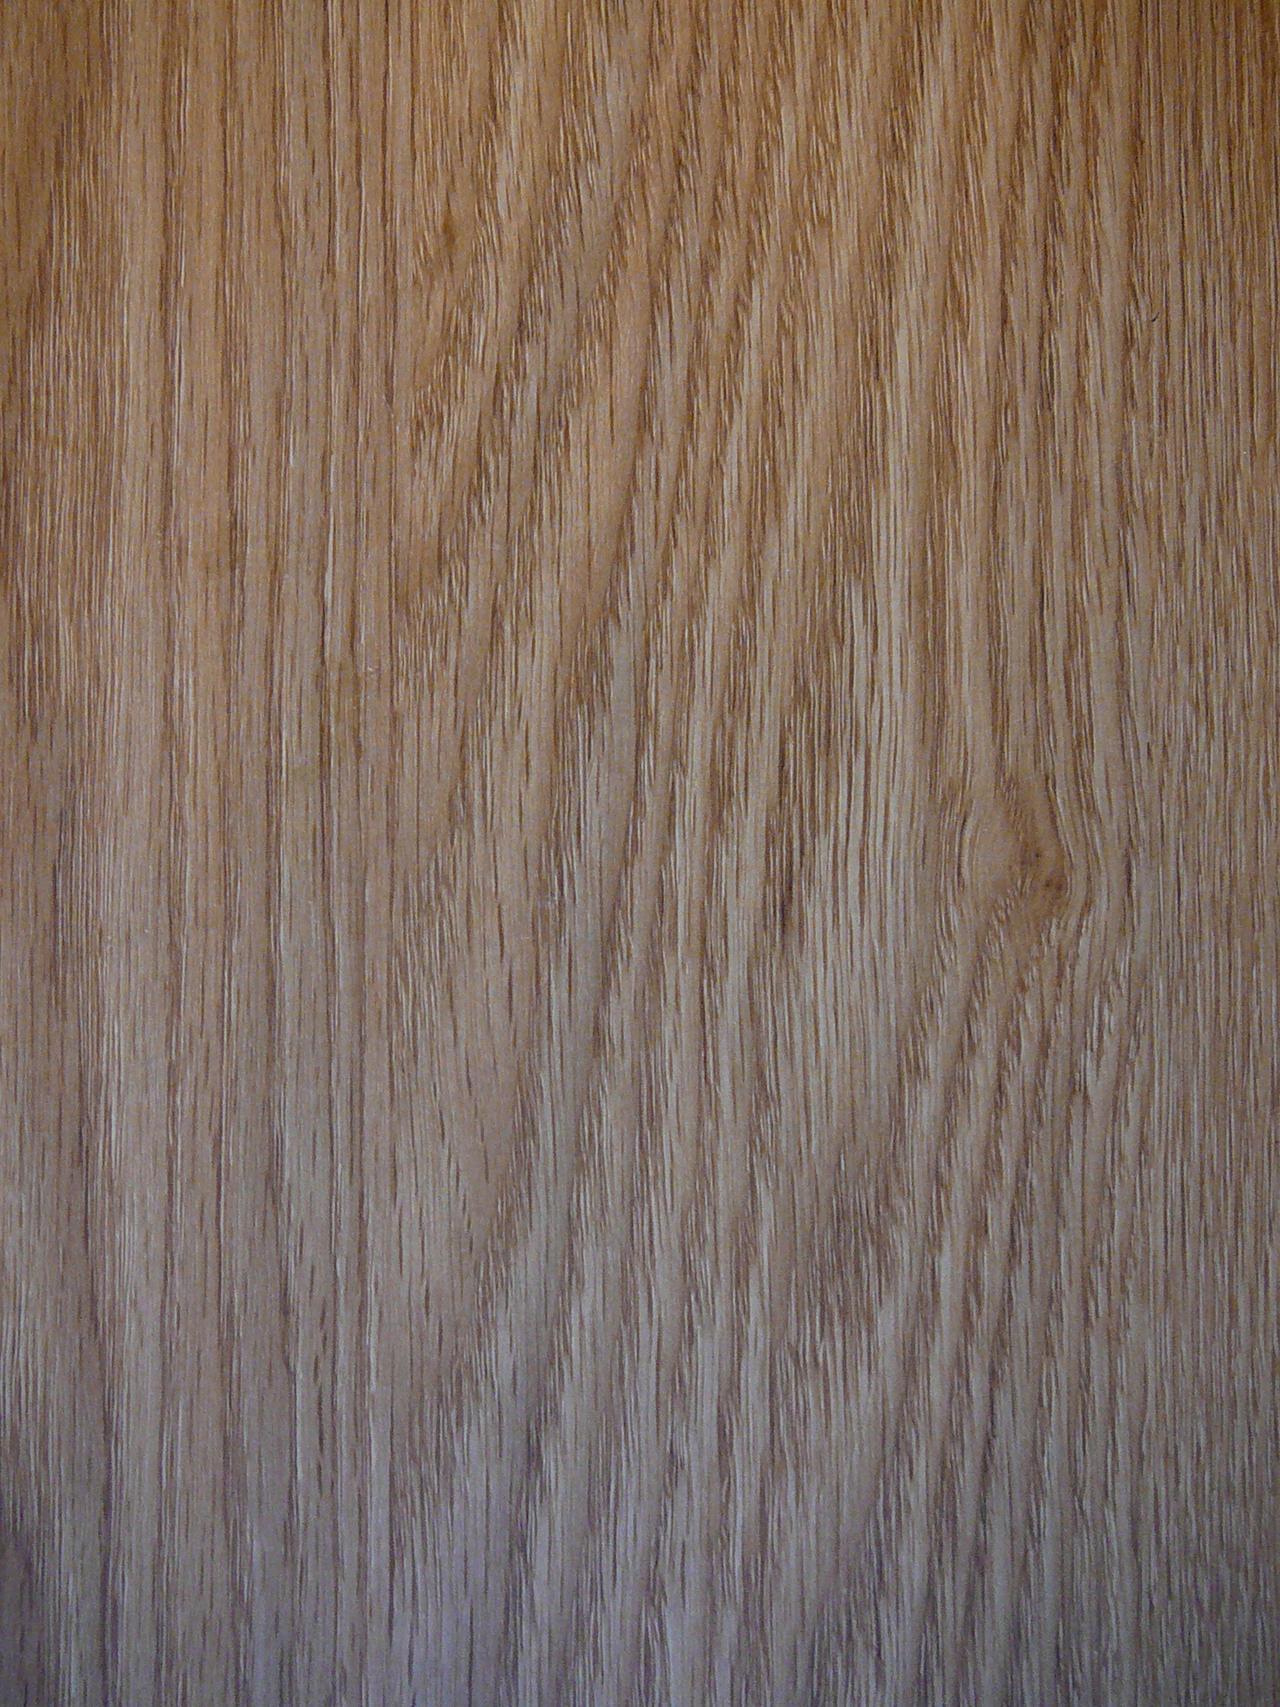 Wood Panel Grain Texture Stock